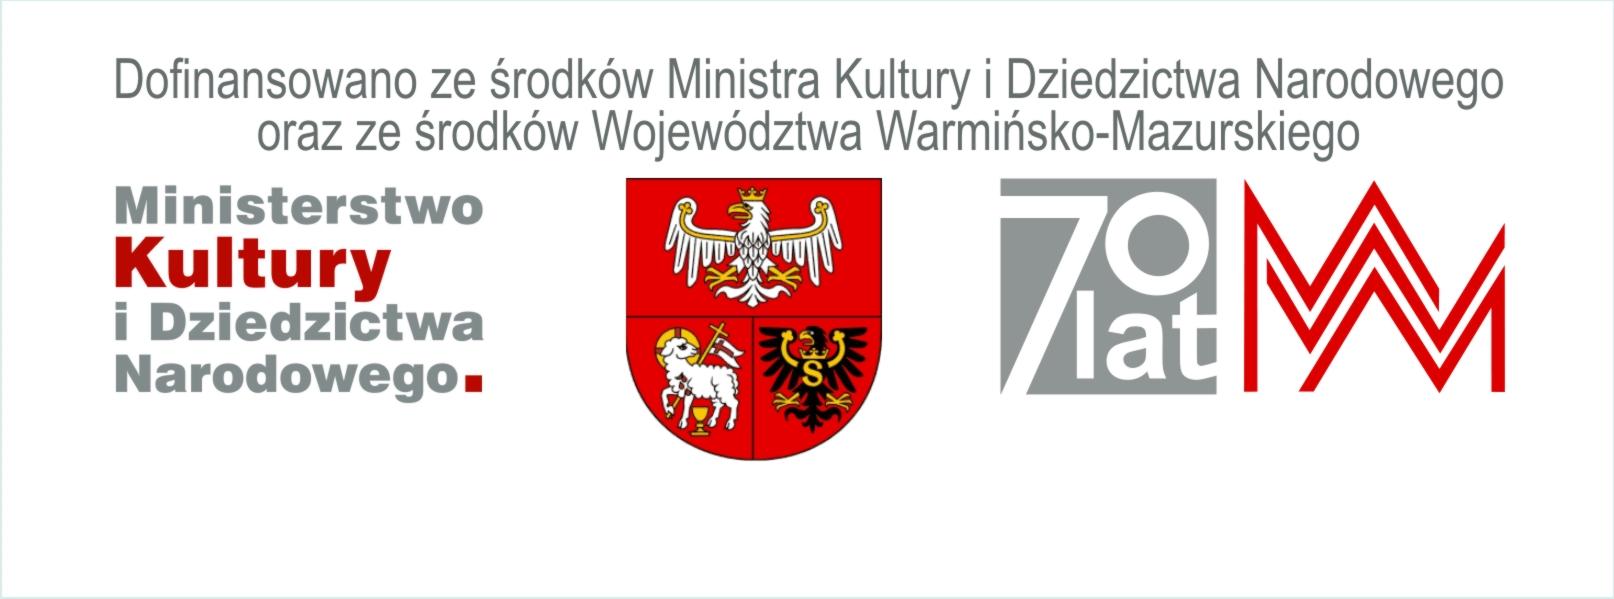 http://m.wmwm.pl/2015/10/orig/belka-z-logo-2-4834.jpg